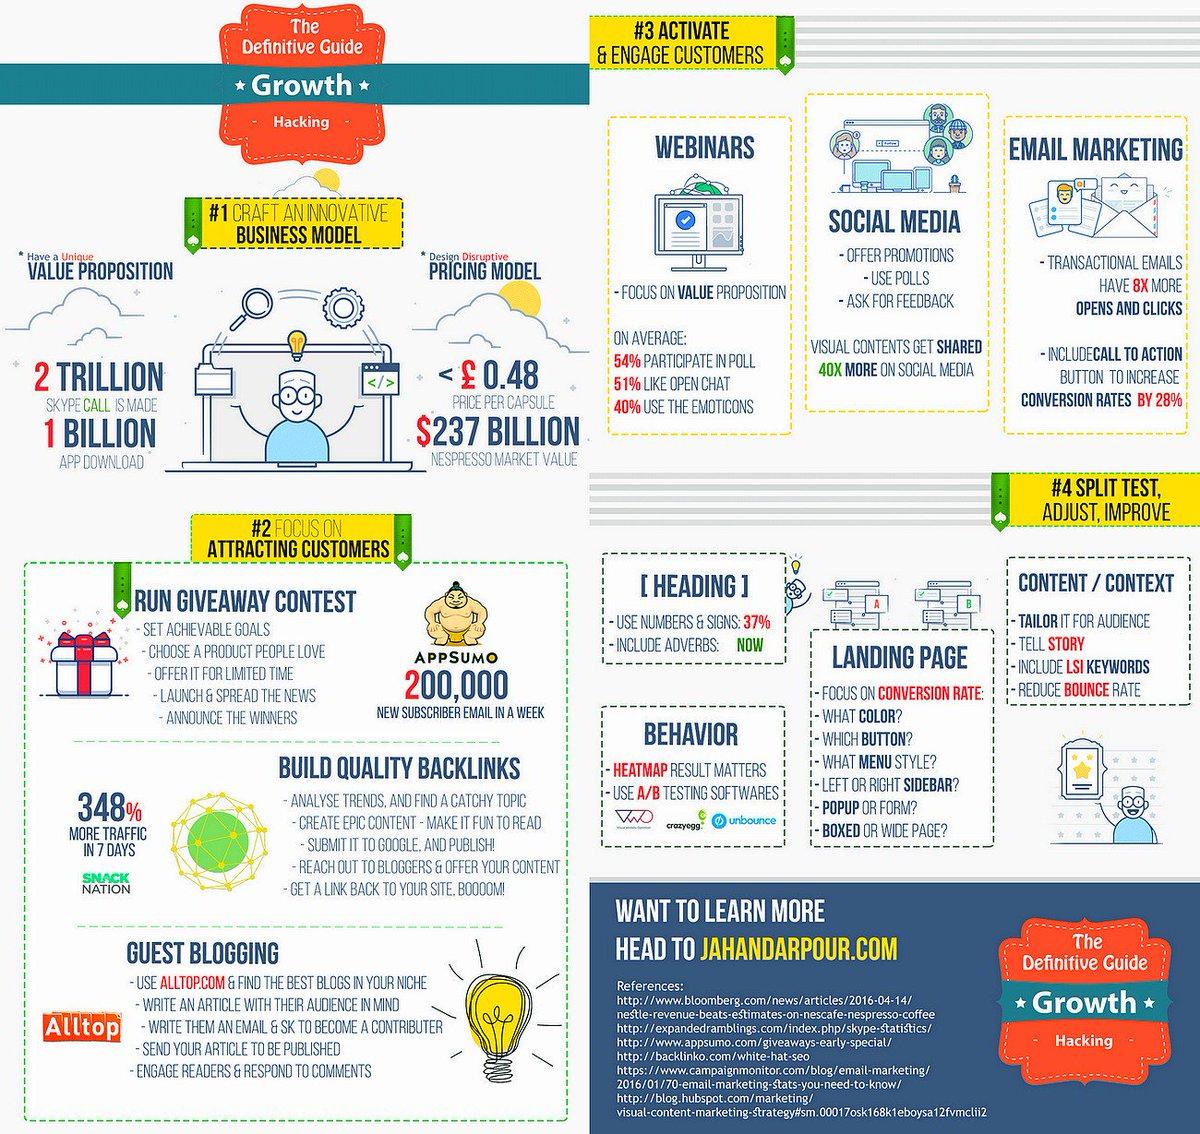 The Advanced Guide to #Growth Hacking [Infographic]  #GrowthHacking #DigitalMarketing #SEO #ContentMarketing #SocialMedia #Marketing<br>http://pic.twitter.com/5Rw24xvb63